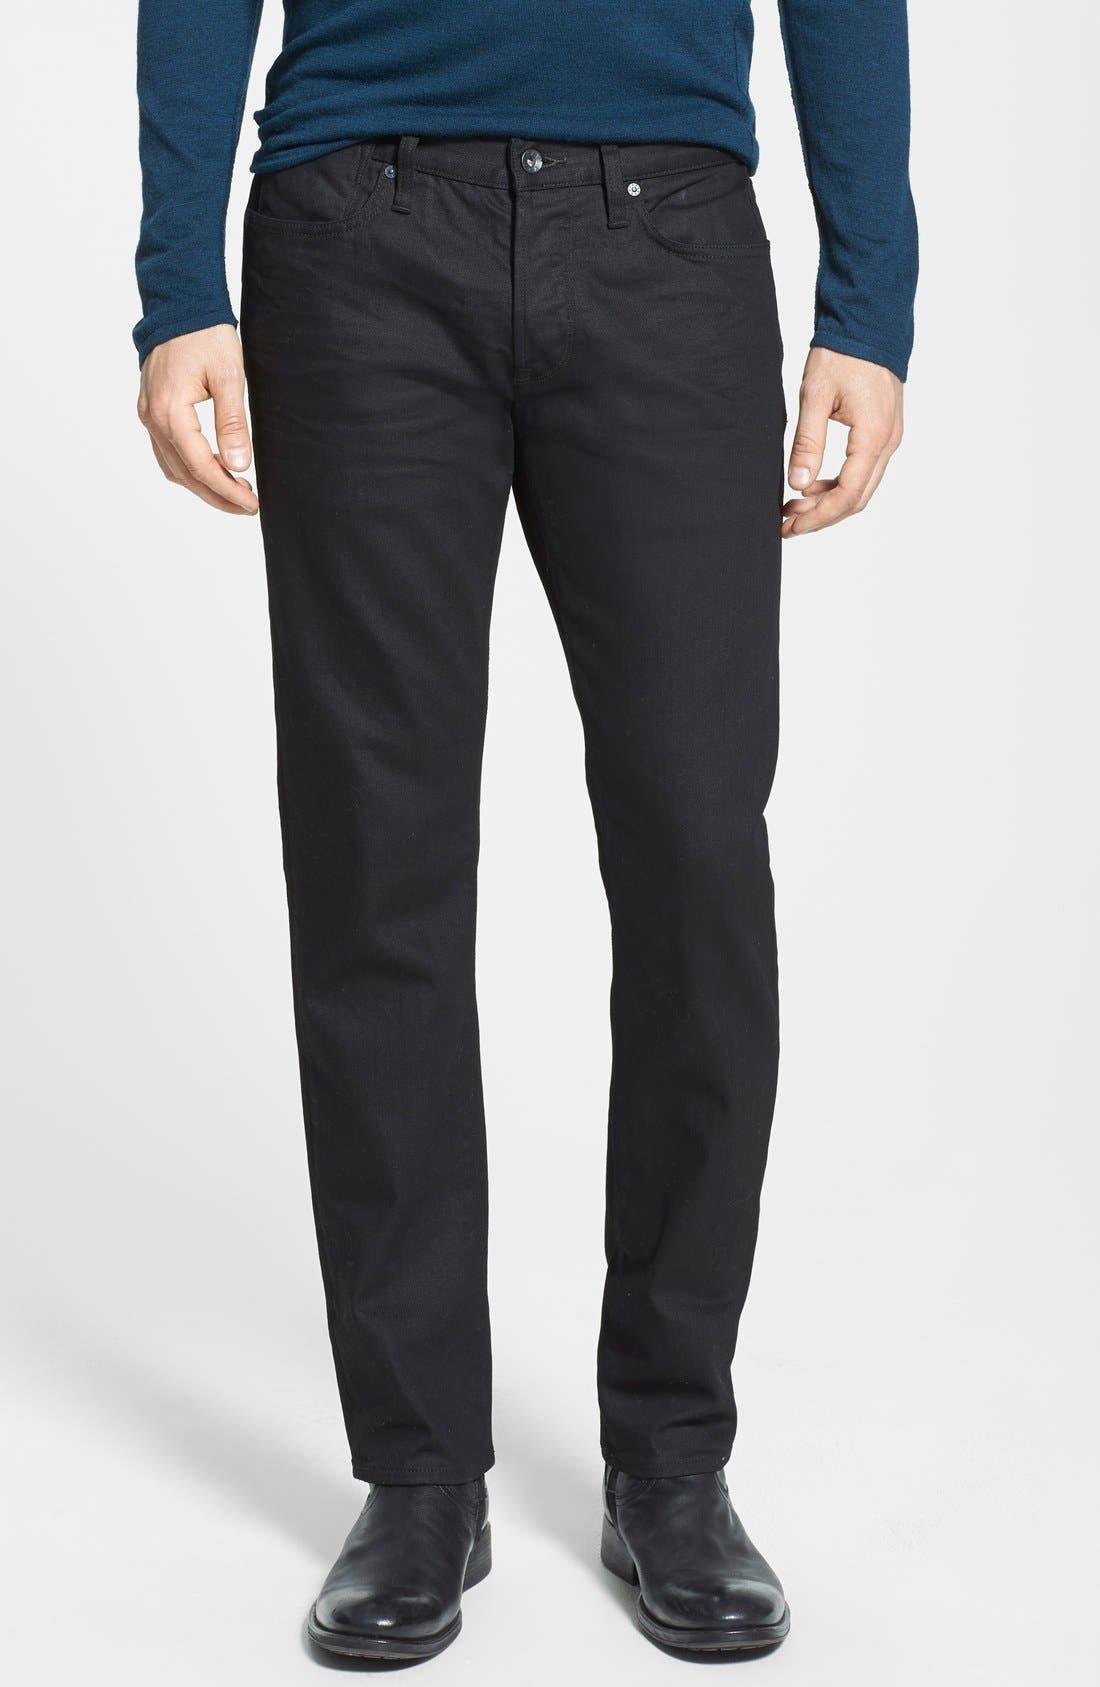 'Bowery' Slim Straight Leg Jeans,                         Main,                         color, Jet Black